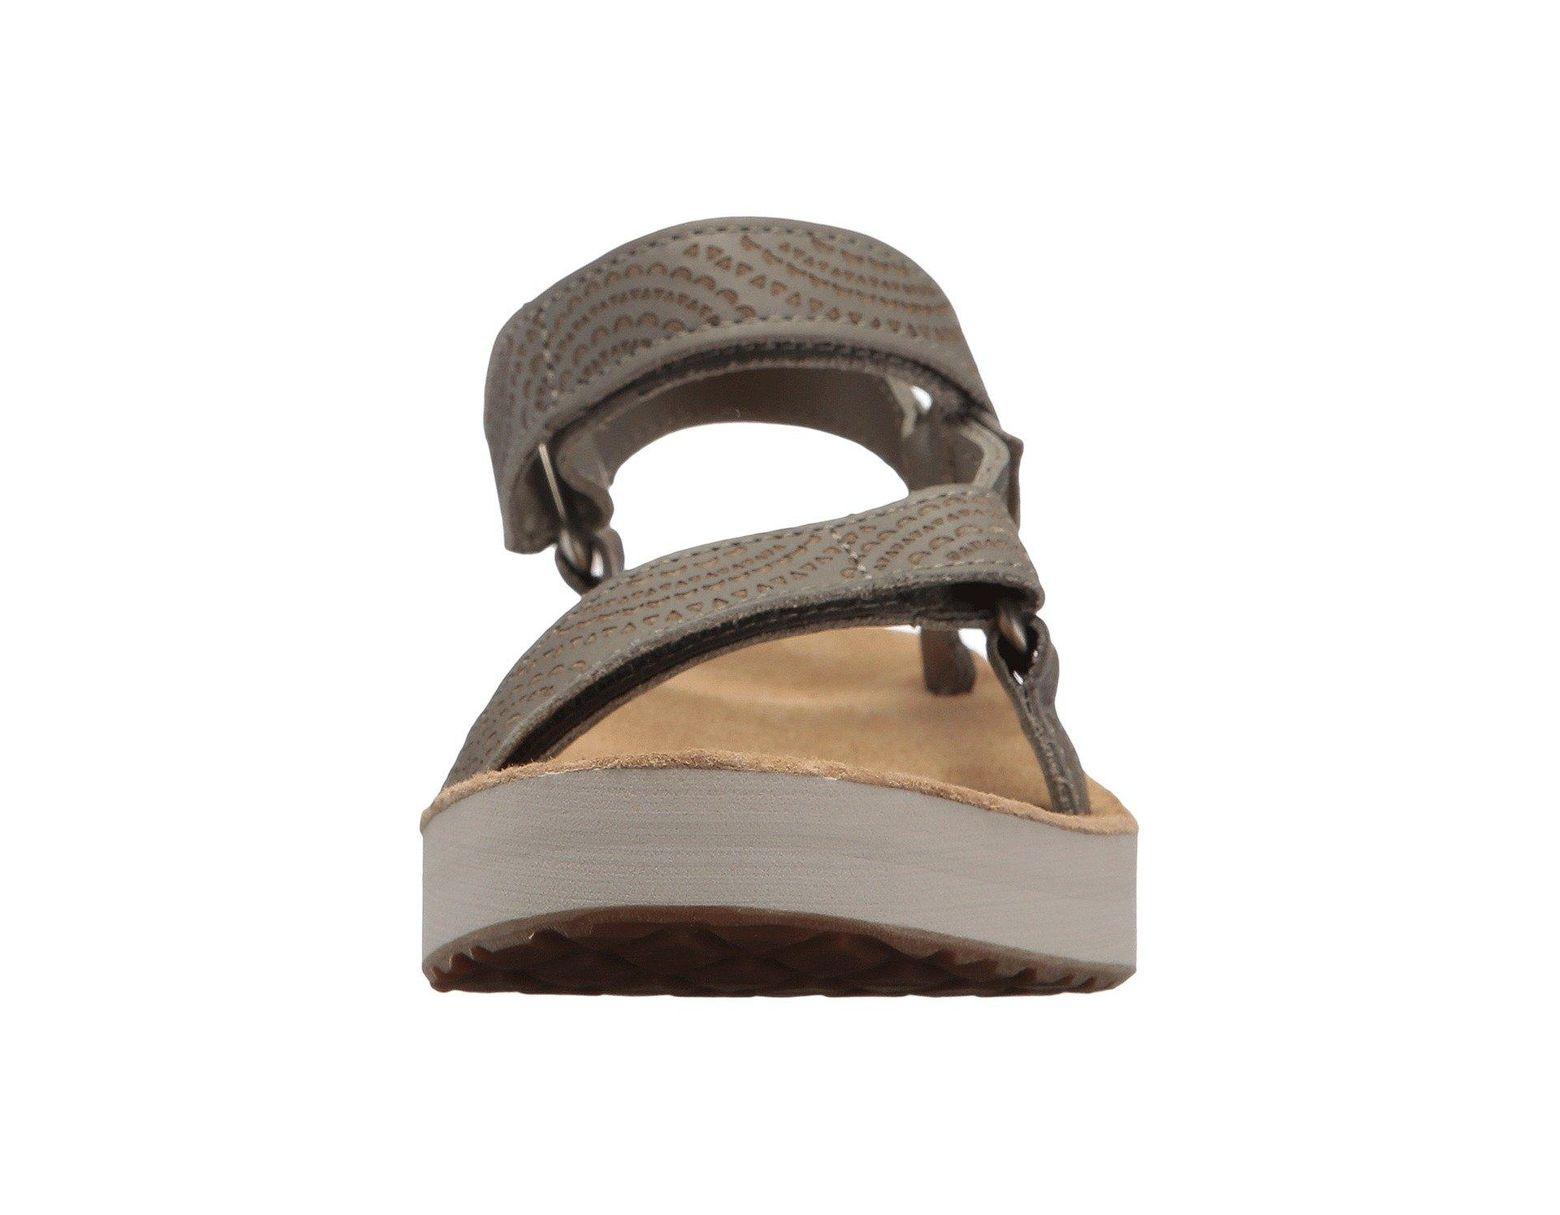 6ae75e636c08 Lyst - Teva Midform Universal Geometric (tan) Women s Shoes